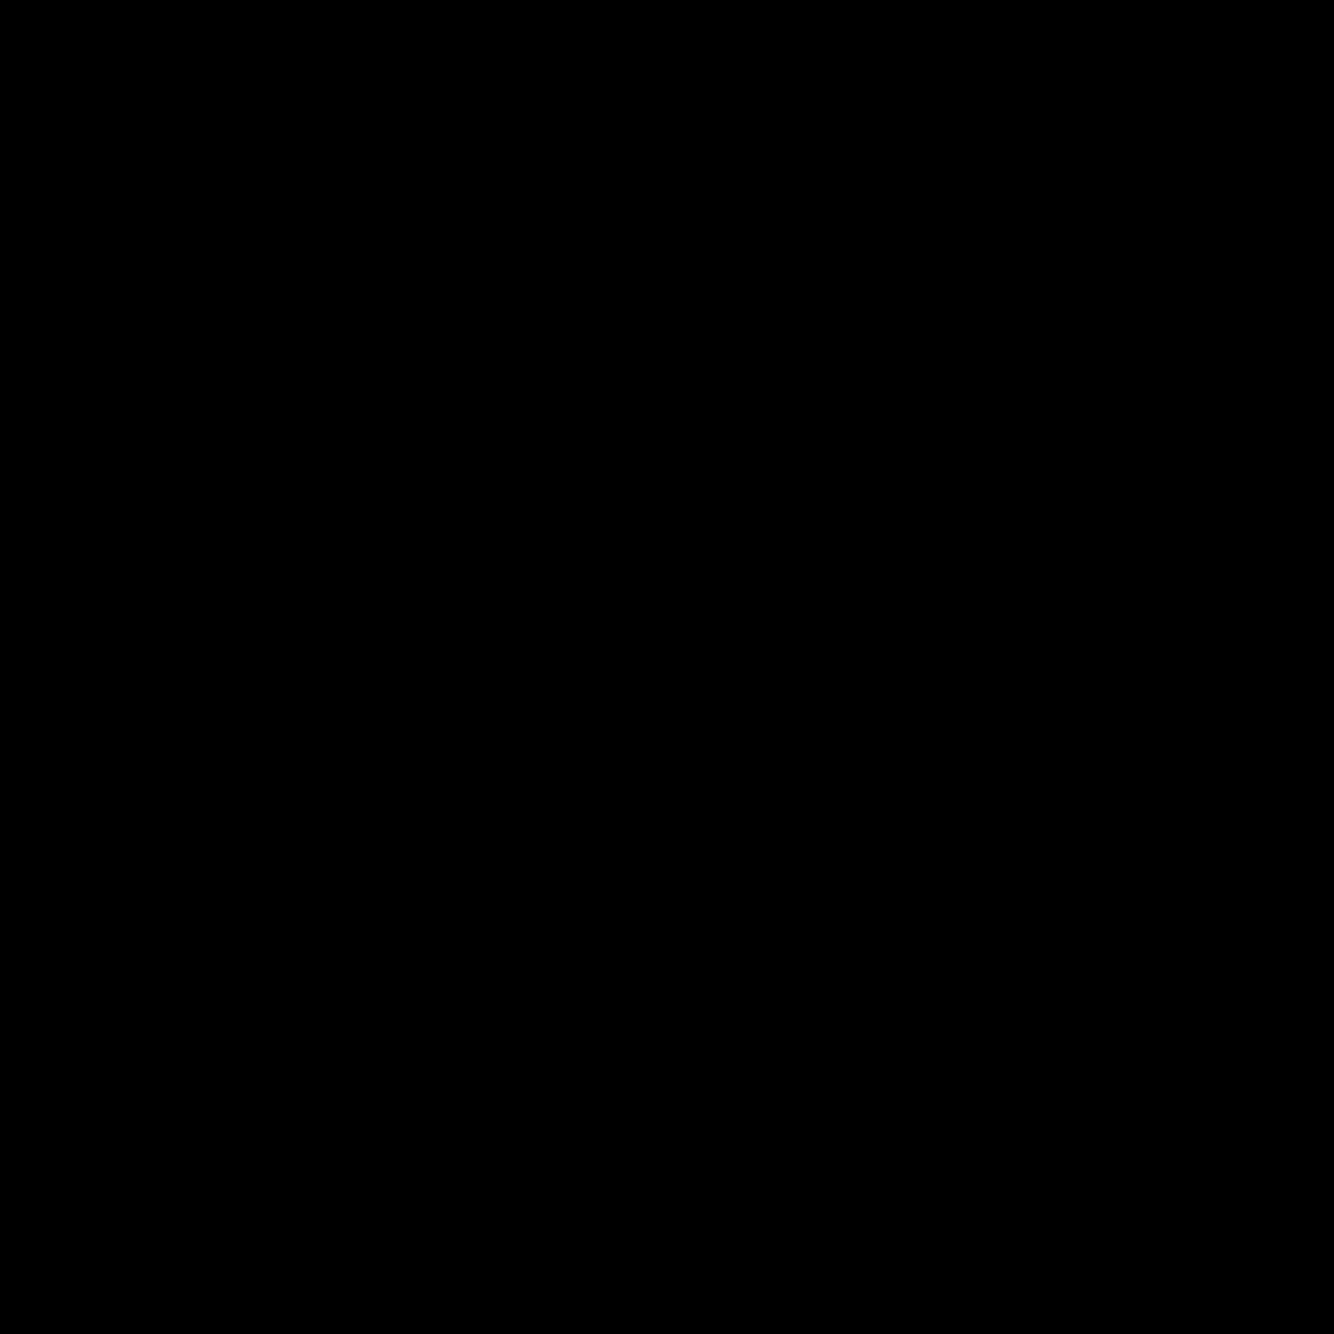 Crunchy_Carrots_Logo.png